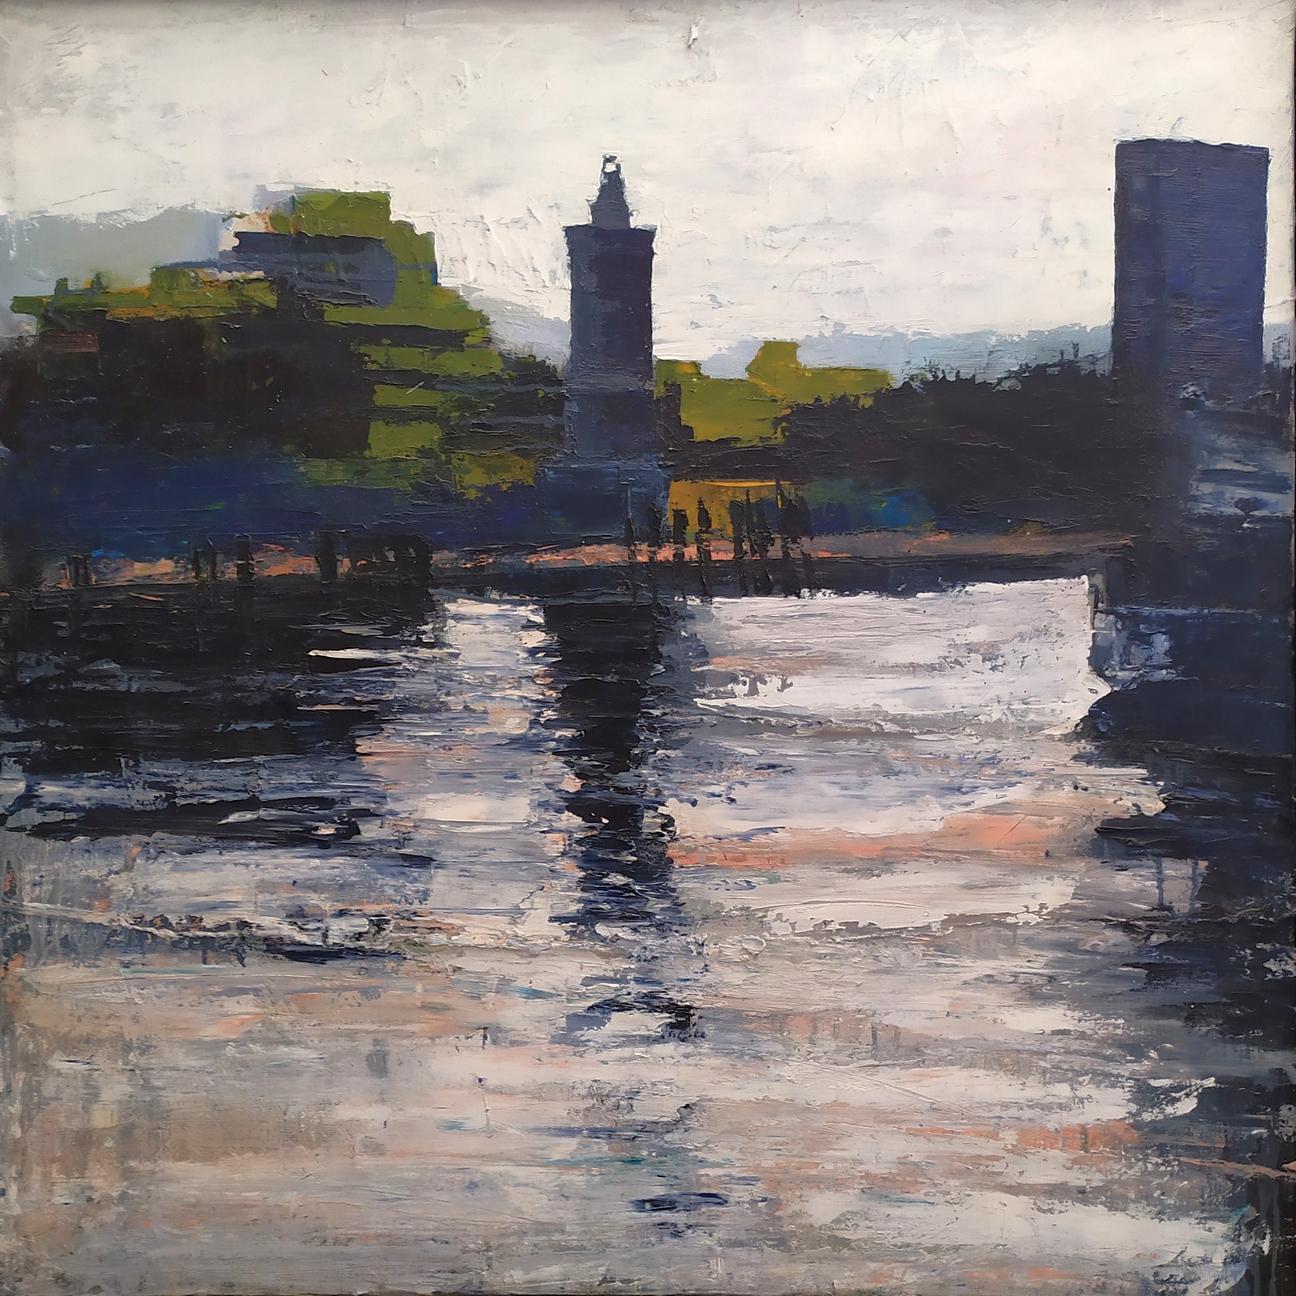 2007 Porto Canale 100x100cm olio su tela